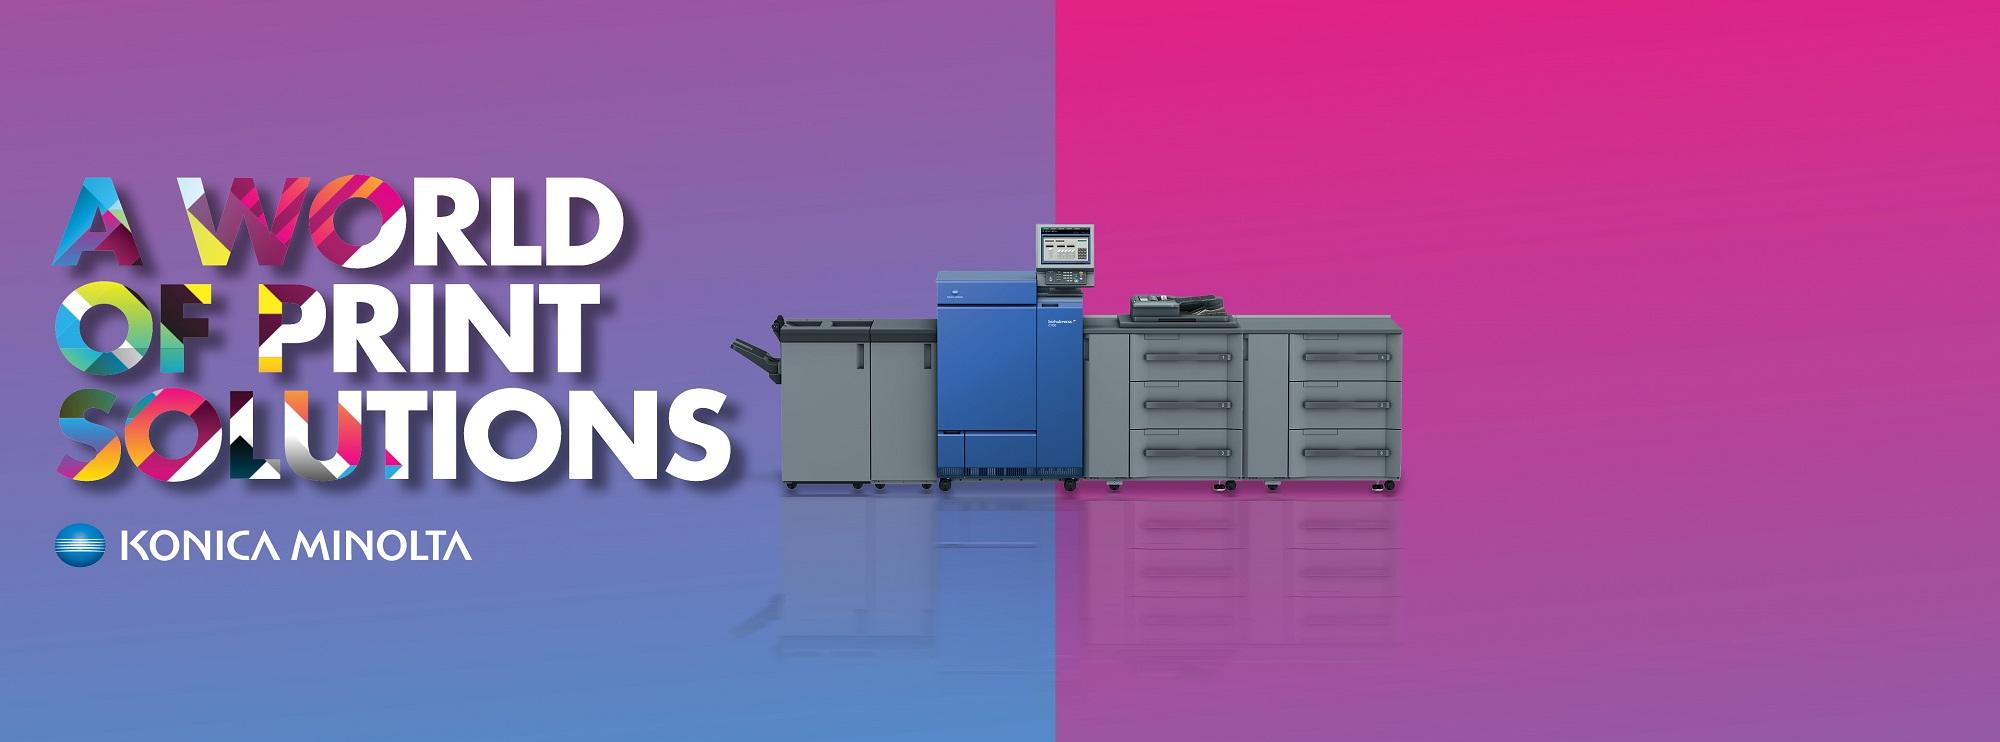 14 222 printers bunners 2000x7423 1, מדפסות לייזר צבע, מדפסות לייזר צבעוניות, מדפסות לייזר לעסק, מדפסות לייזר למשרד